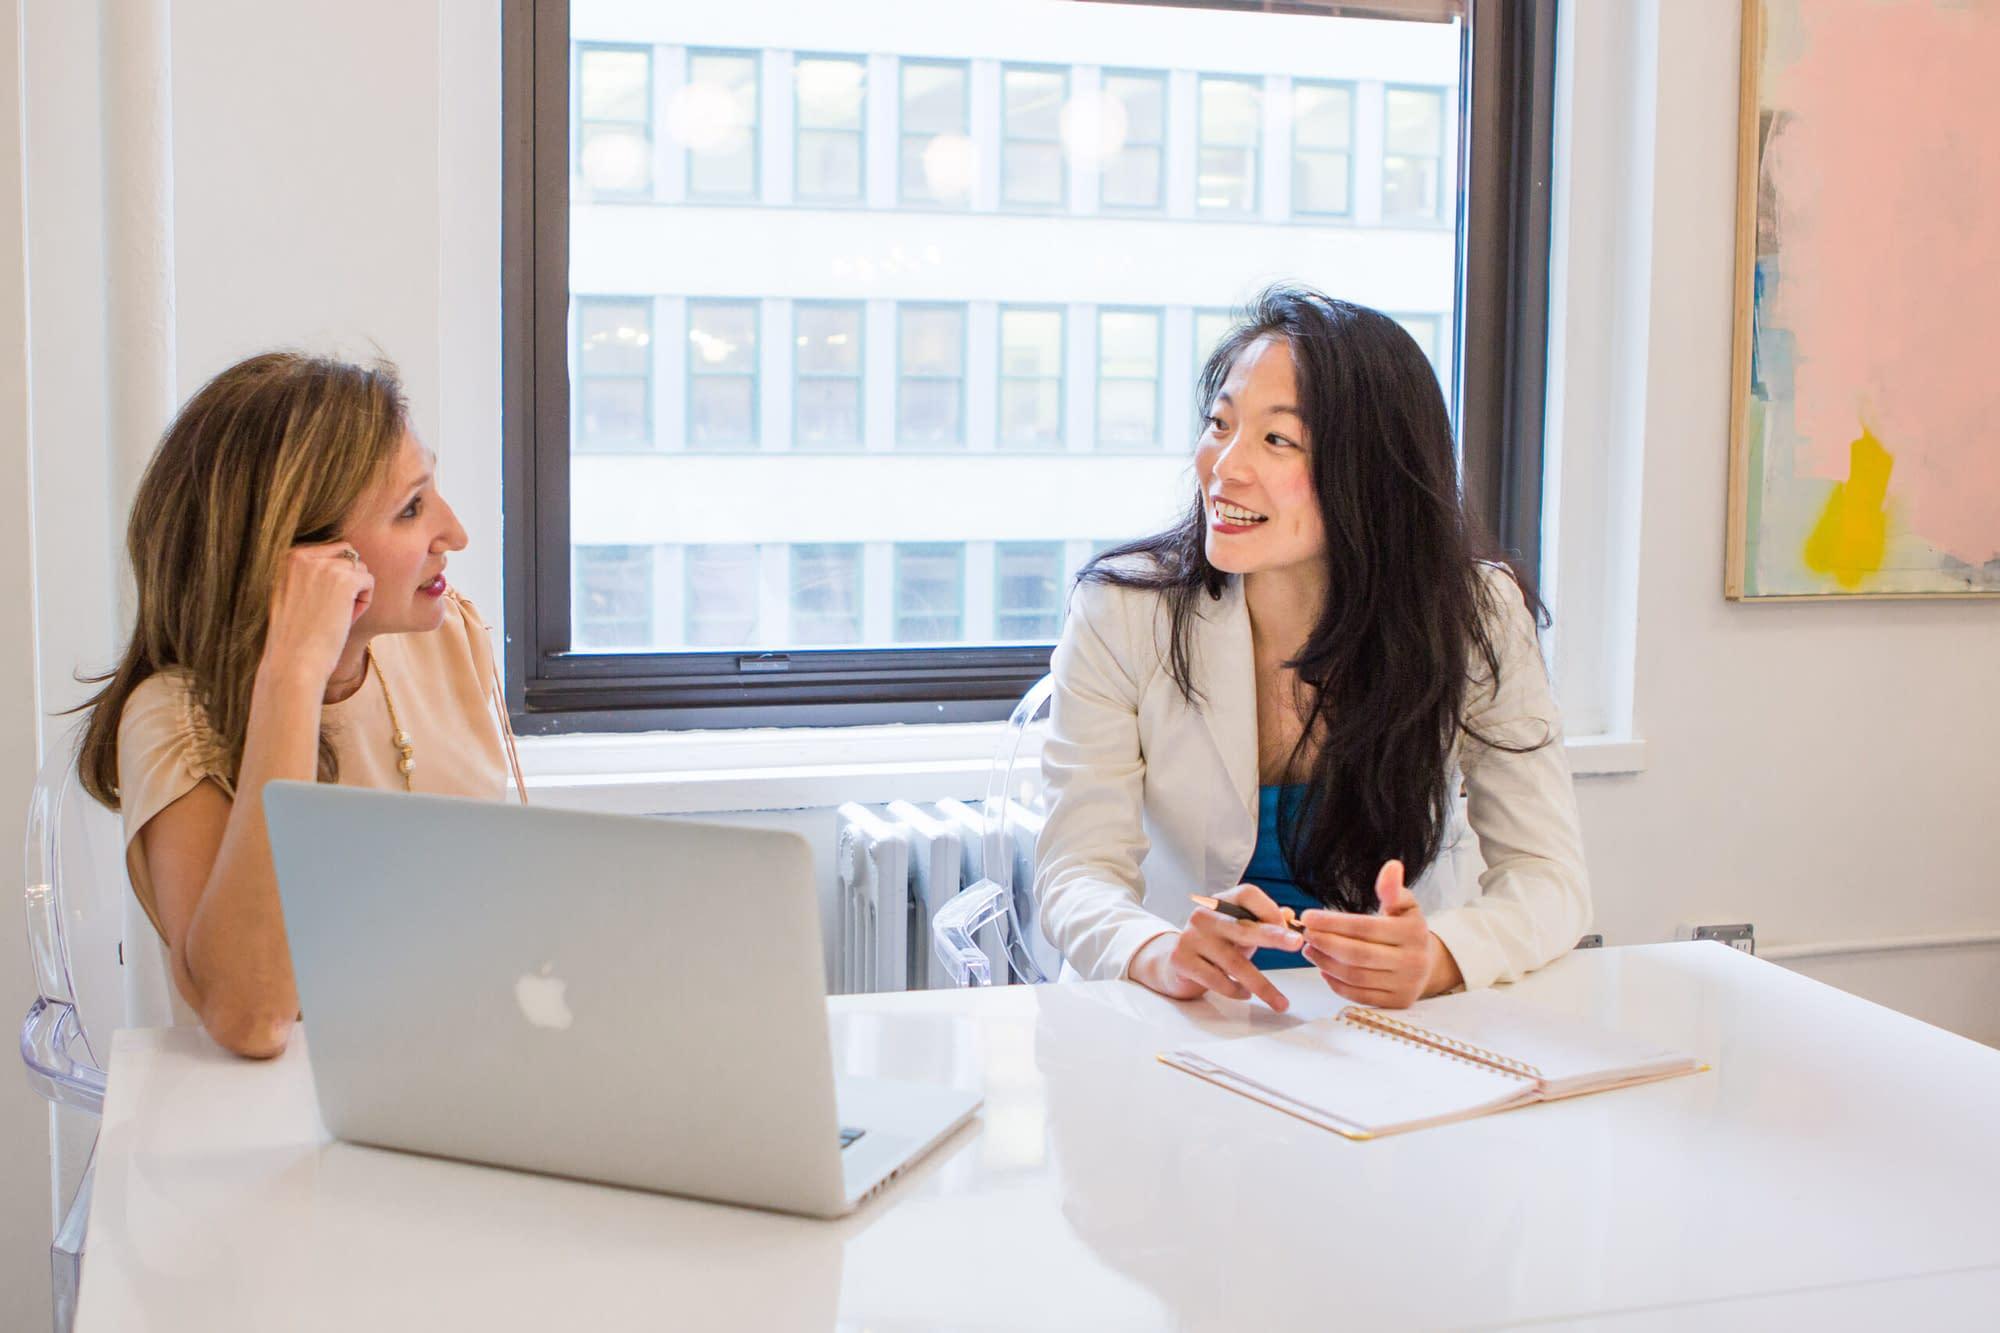 Female Founders We Love: Fairygodboss, a Network for Women